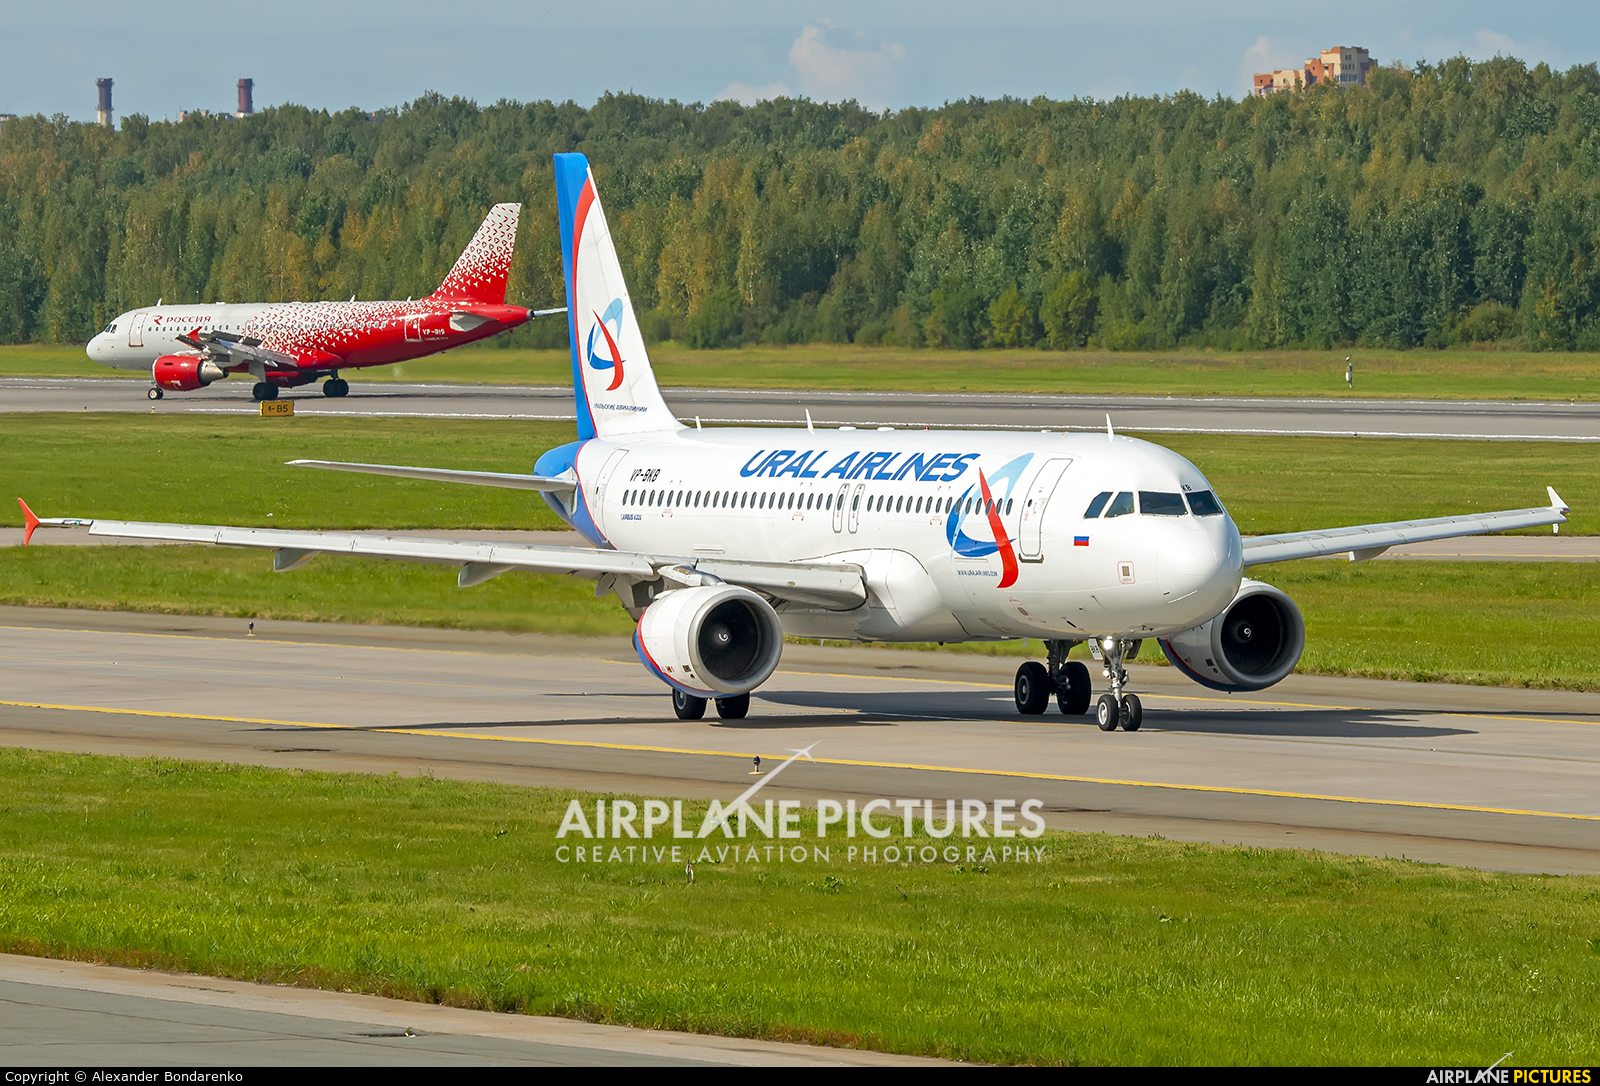 Ural Airlines VP-BKB aircraft at St. Petersburg - Pulkovo